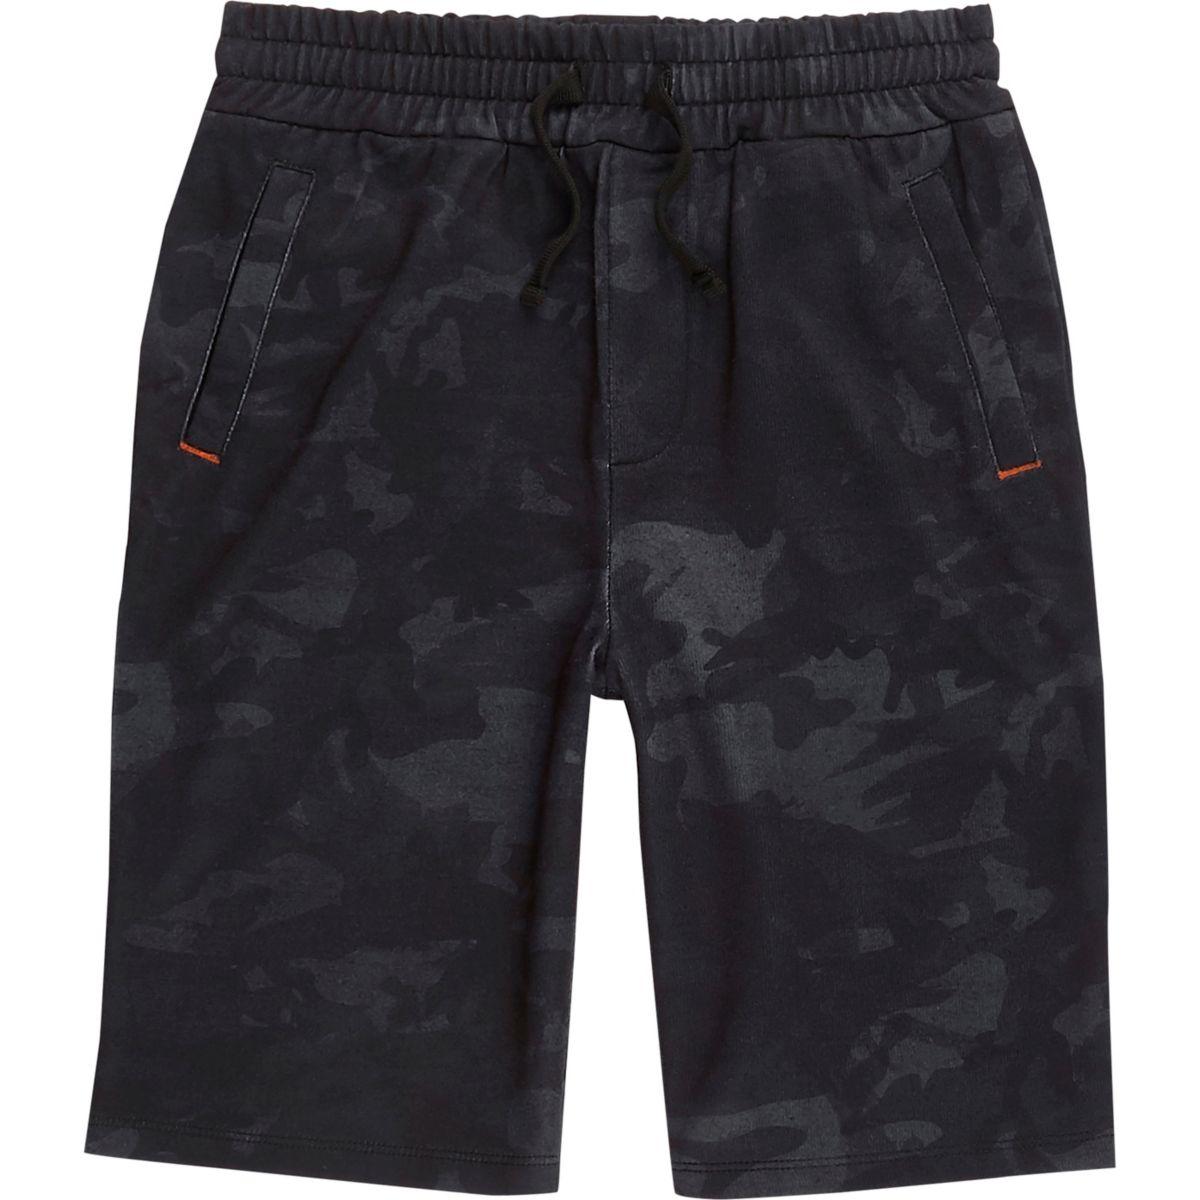 Short en jersey bleu marine et camouflage pour garçon